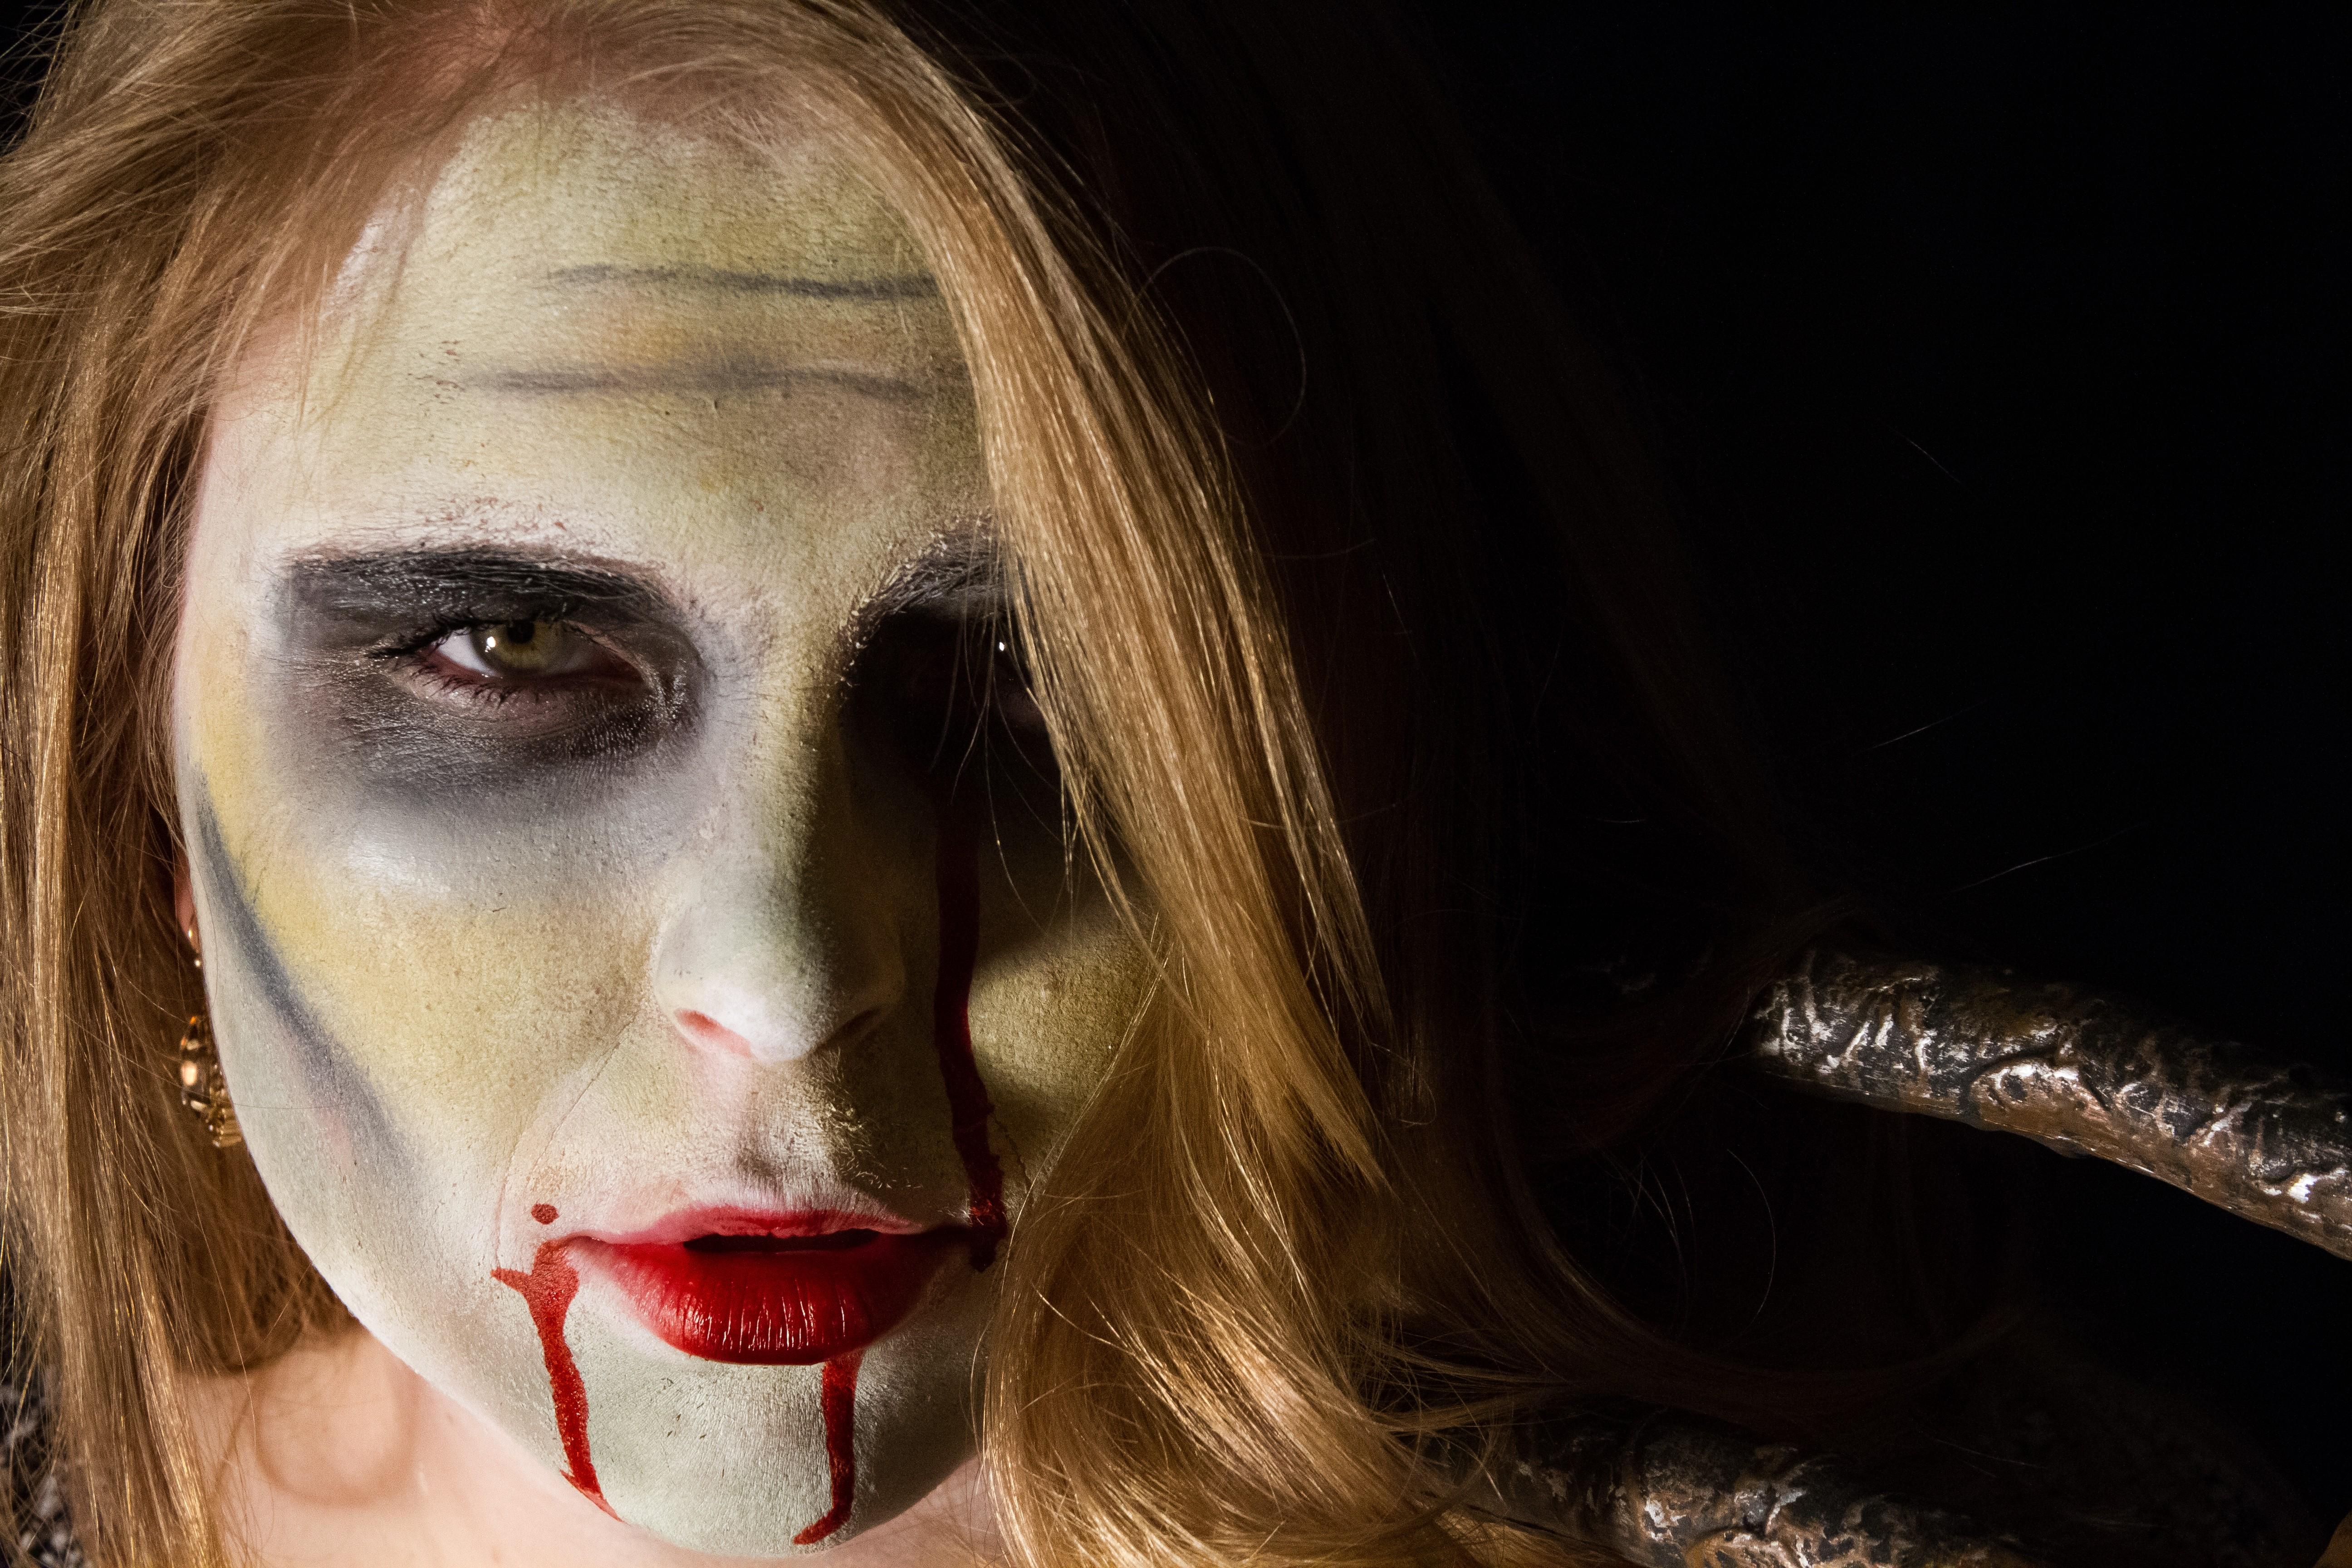 Tendenci Zombie Photos 2013 - 37